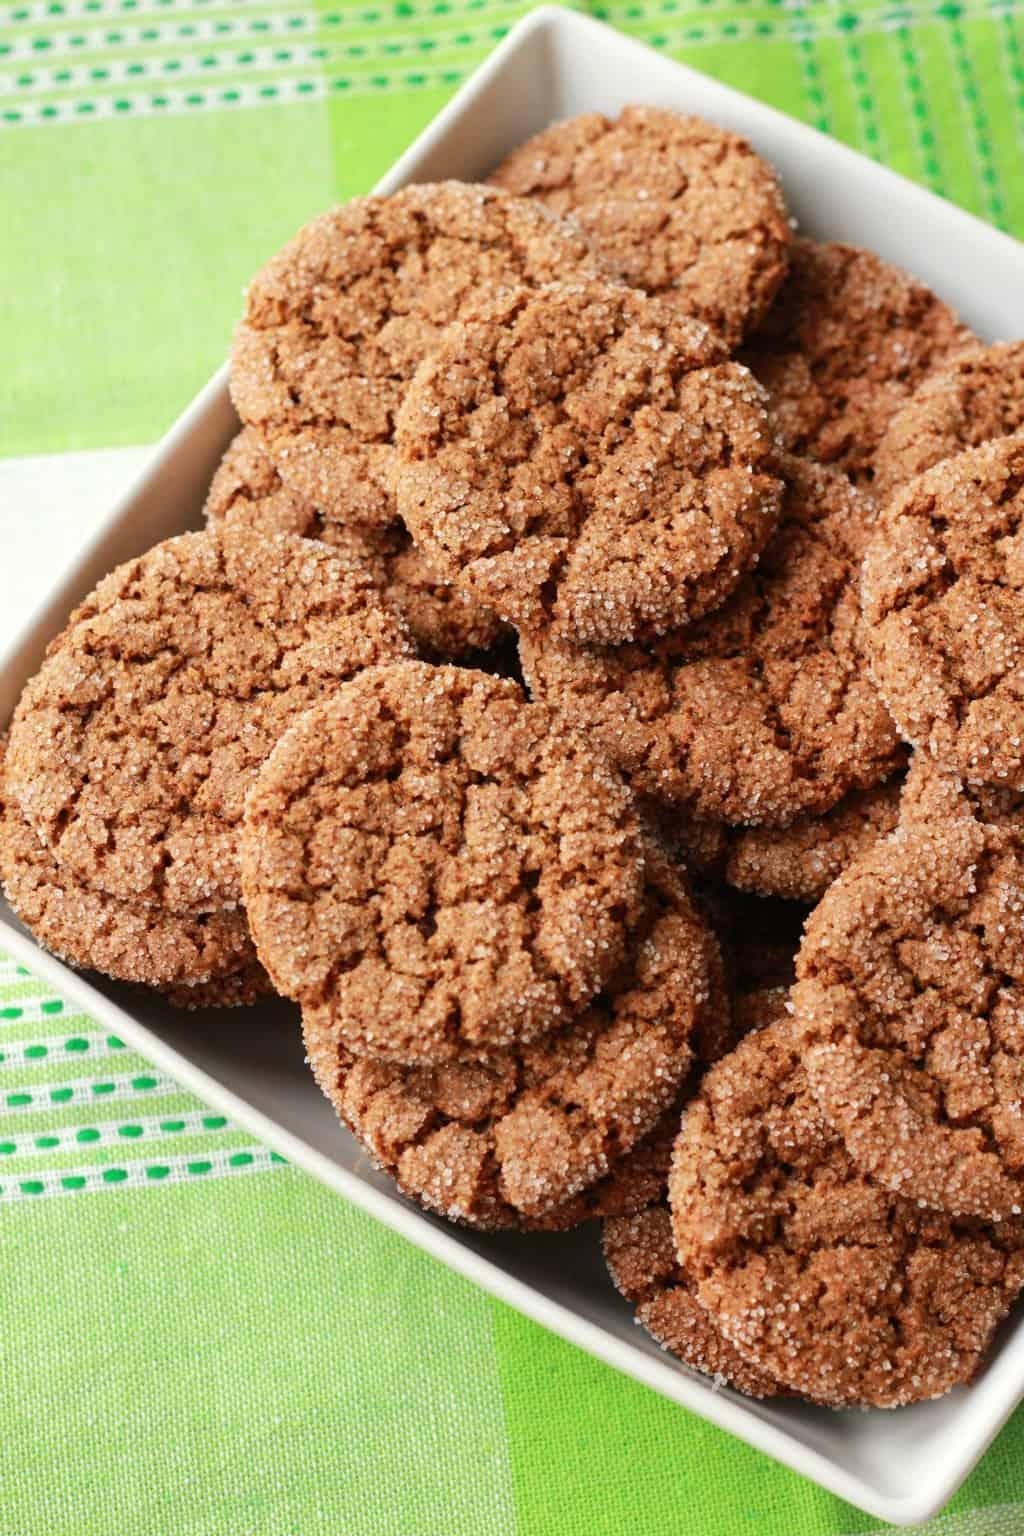 Vegan Gingersnap Cookies. Super crunchy and perfect for a snack. #vegan #lovingitvegan #cookies #gingersnap #dessert